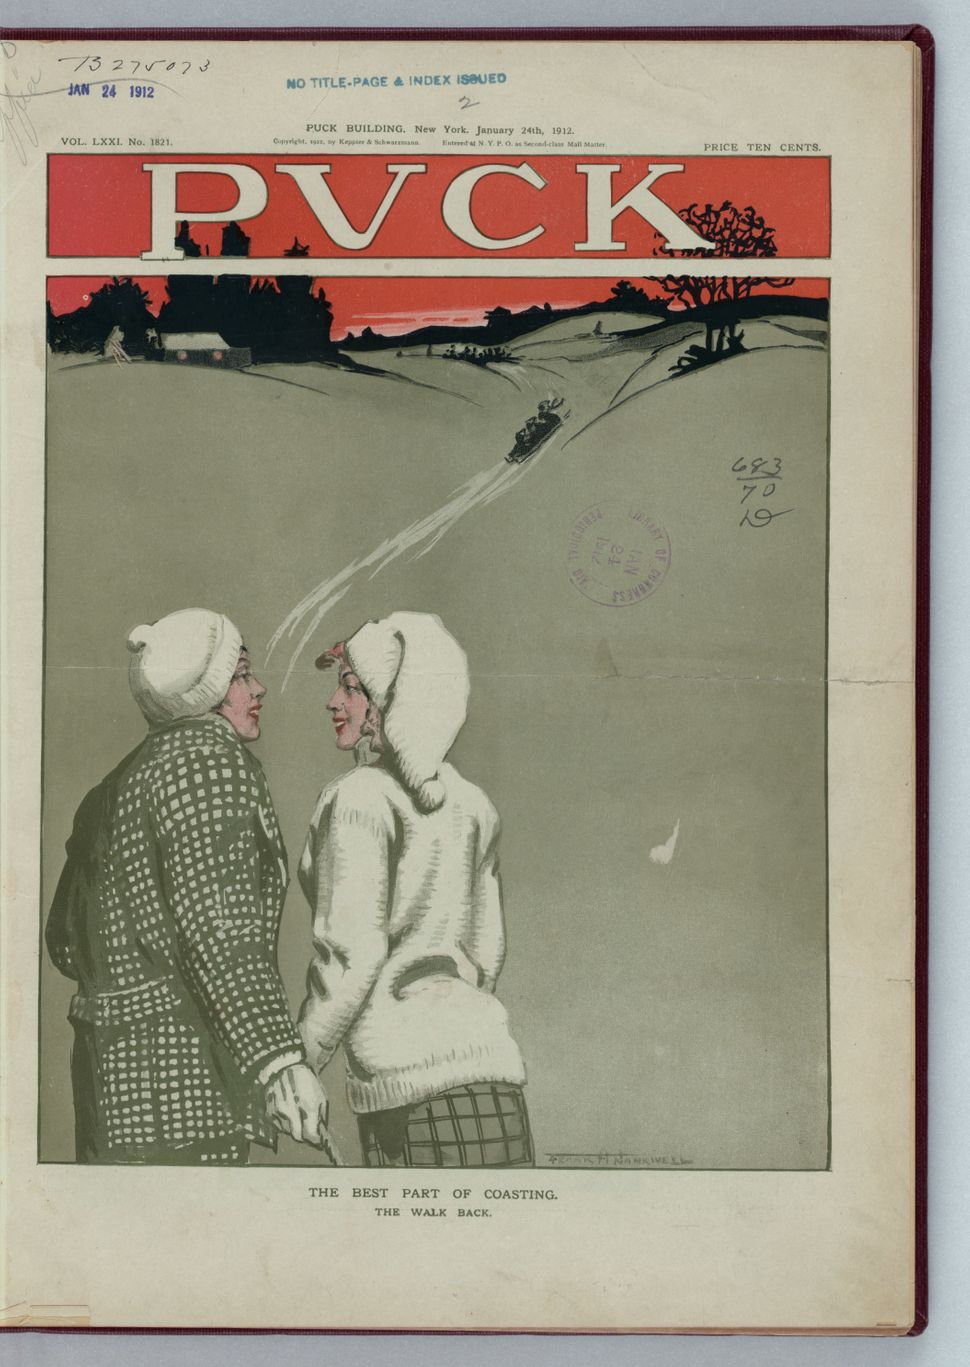 January 24, 1912 (Artist Frank A. Nankivell, 1869-1959)